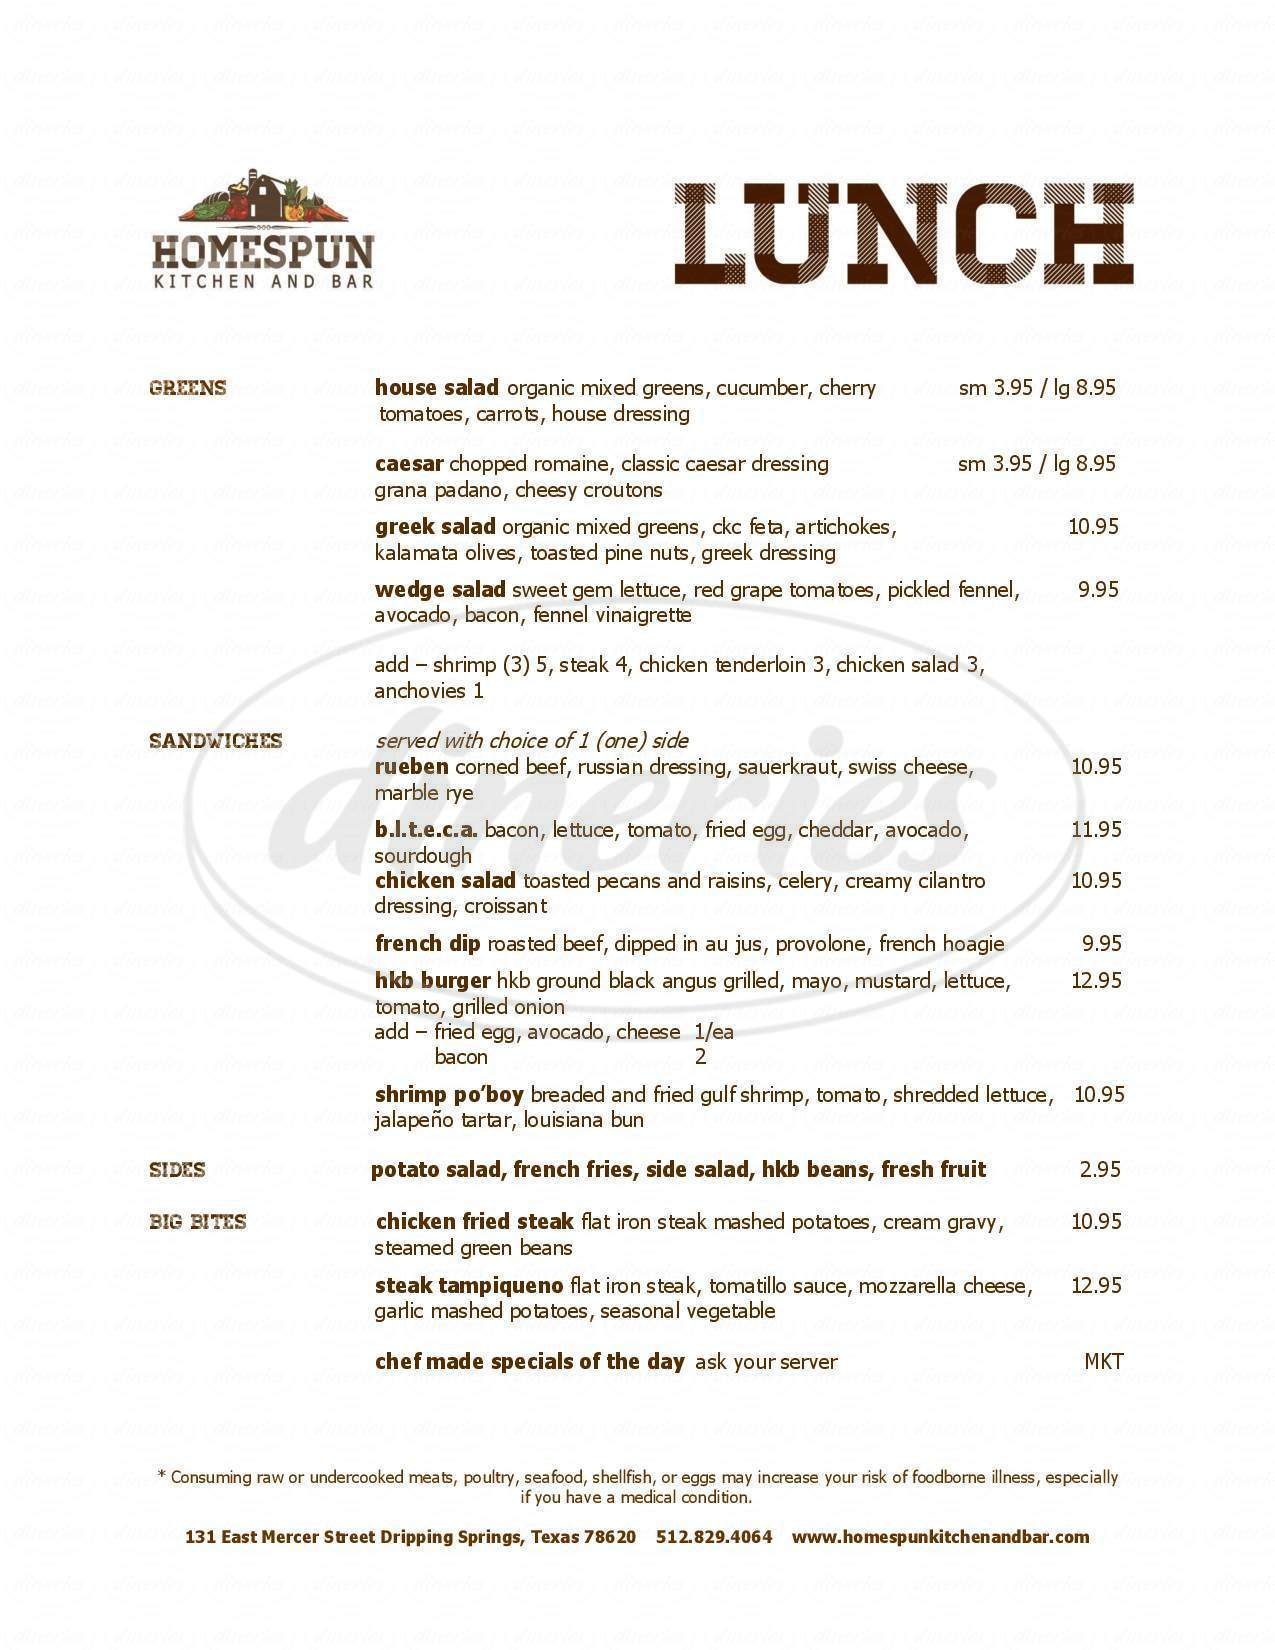 Homespun Kitchen And Bar Menu - Dripping Springs - Dineries